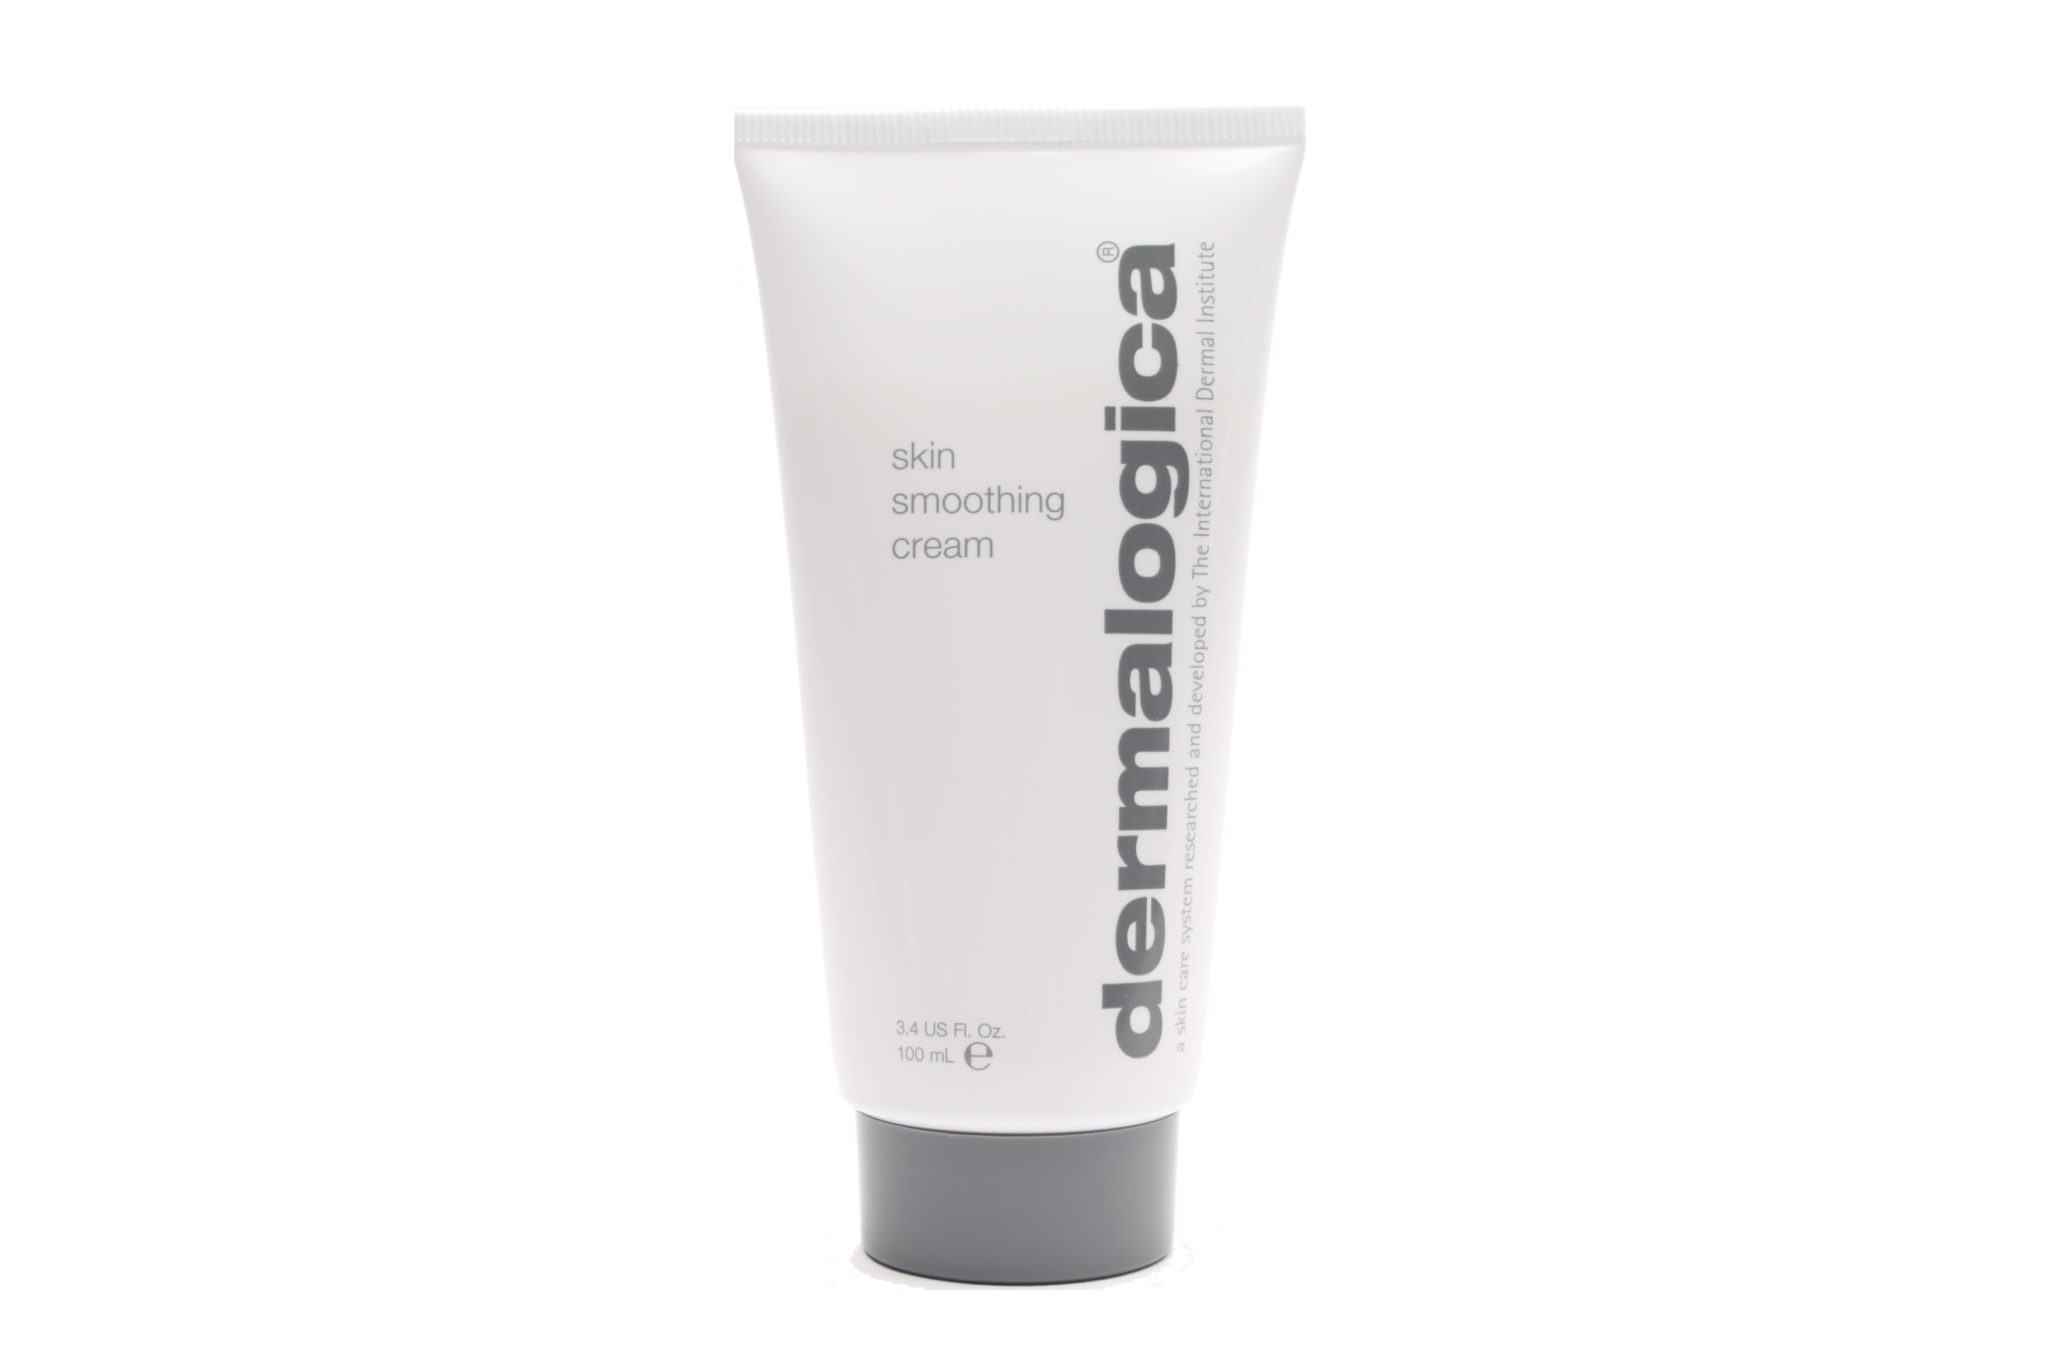 26596 Skin Smoothing Cream 3.4 oz Front